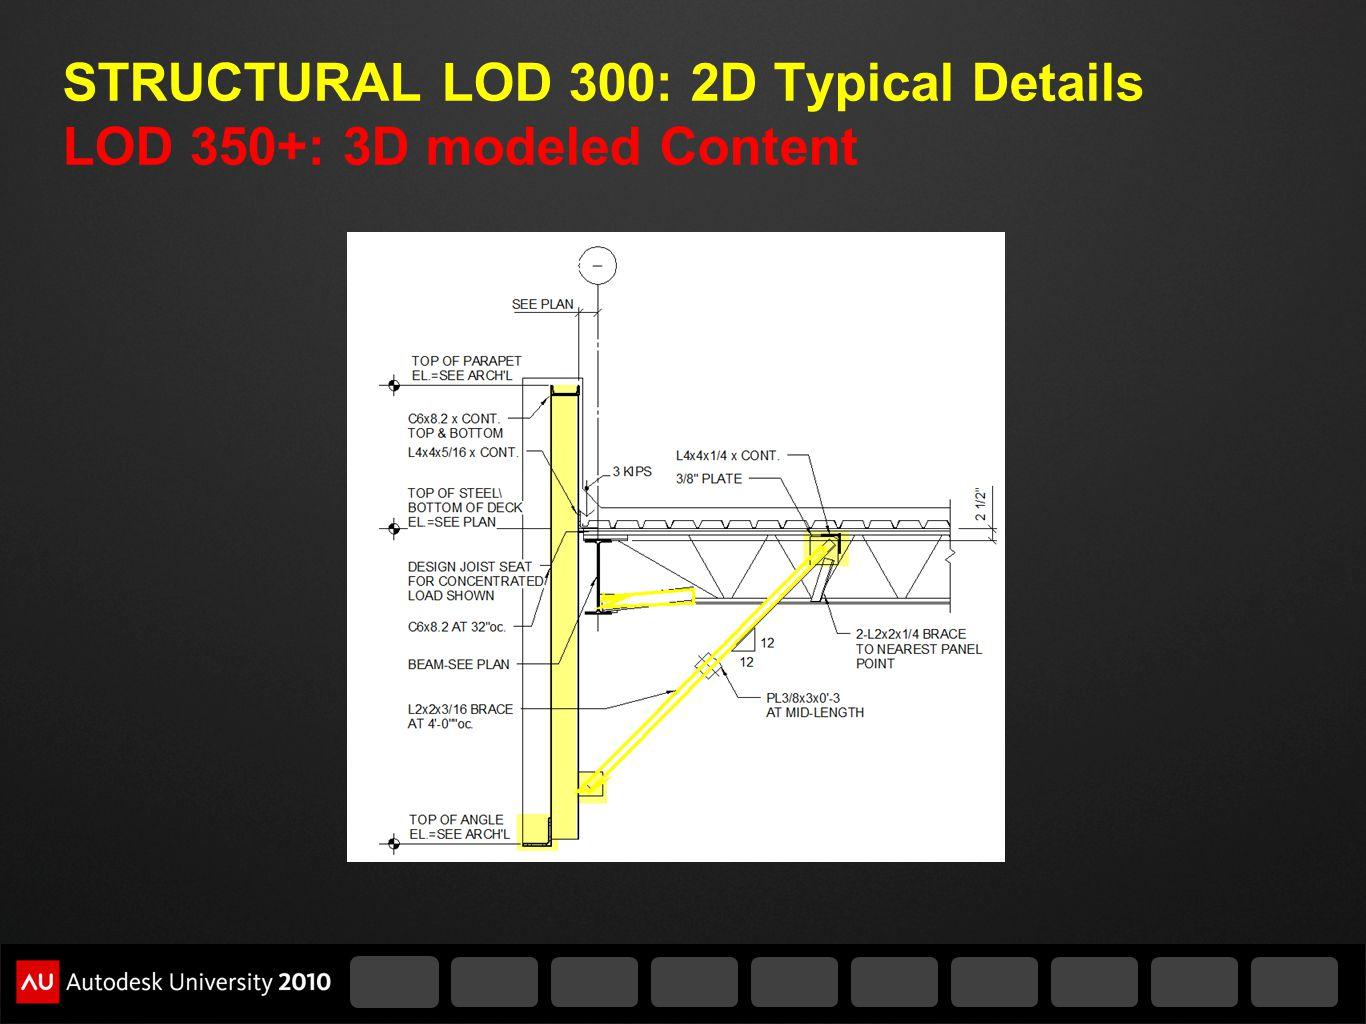 STRUCTURAL LOD 300: 2D Typical Details LOD 350+: 3D modeled Content